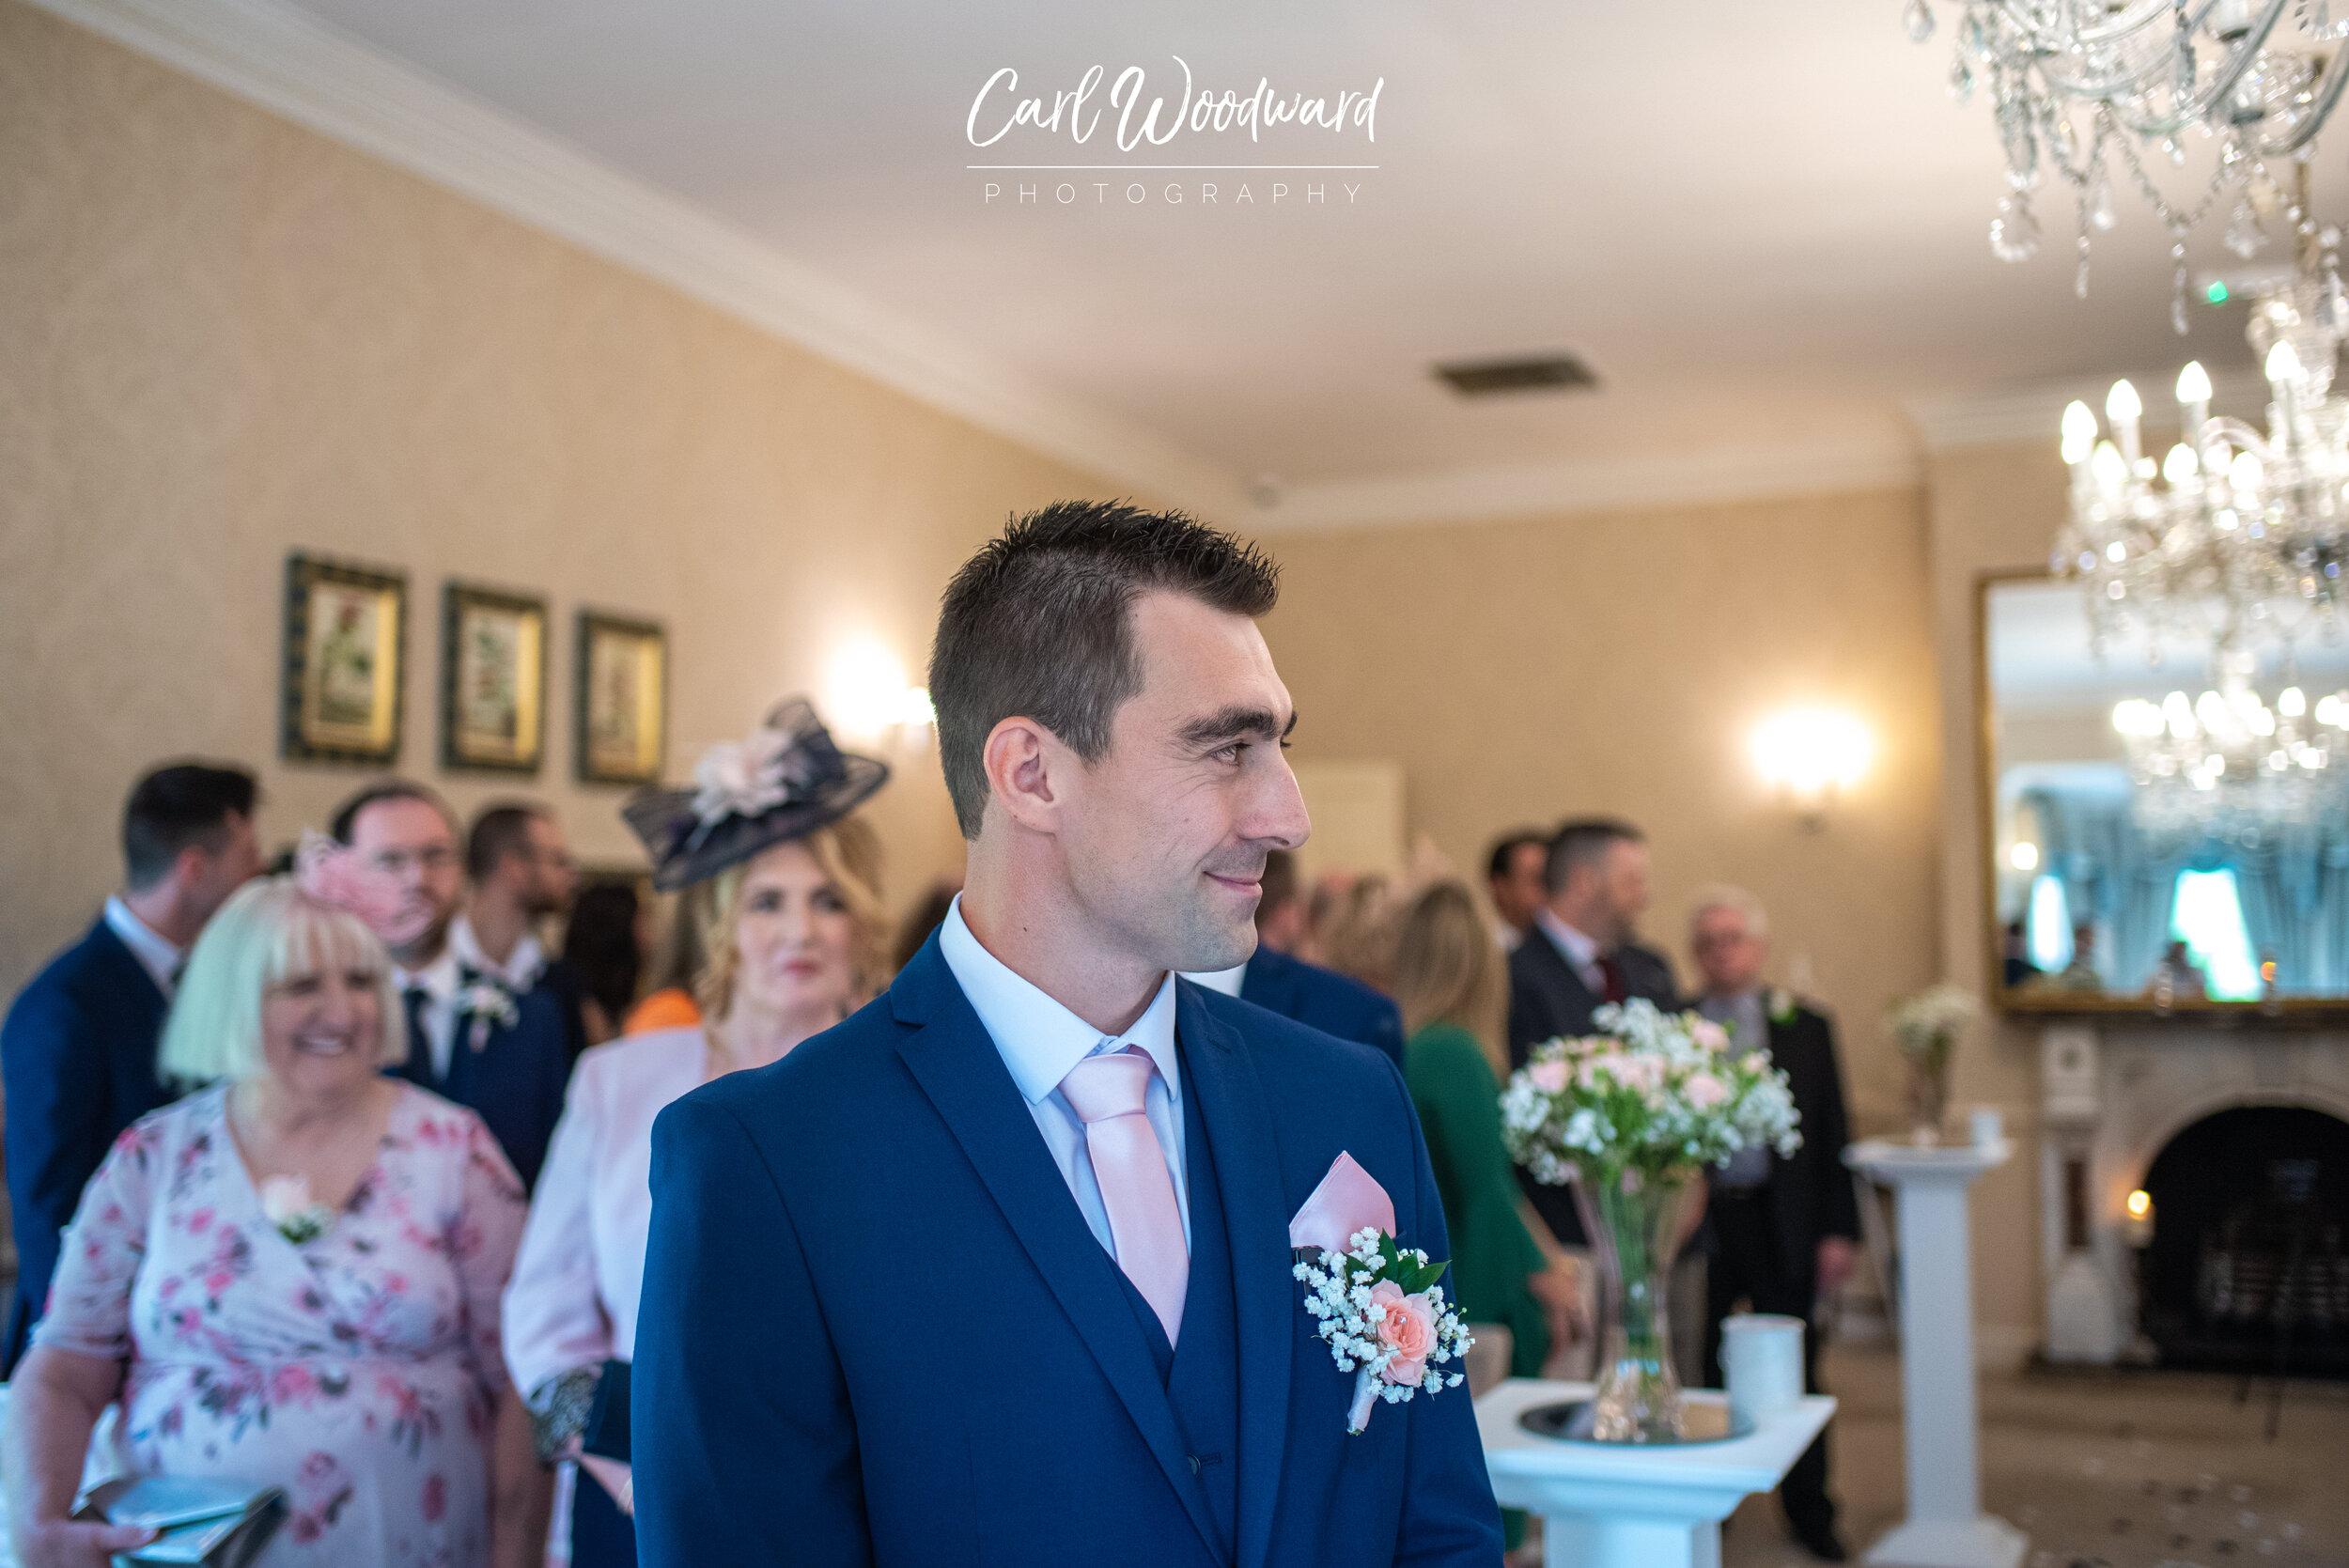 007-De-Courcesys-Manor-Weddings-Cardiff-Wedding-Photographer.jpg